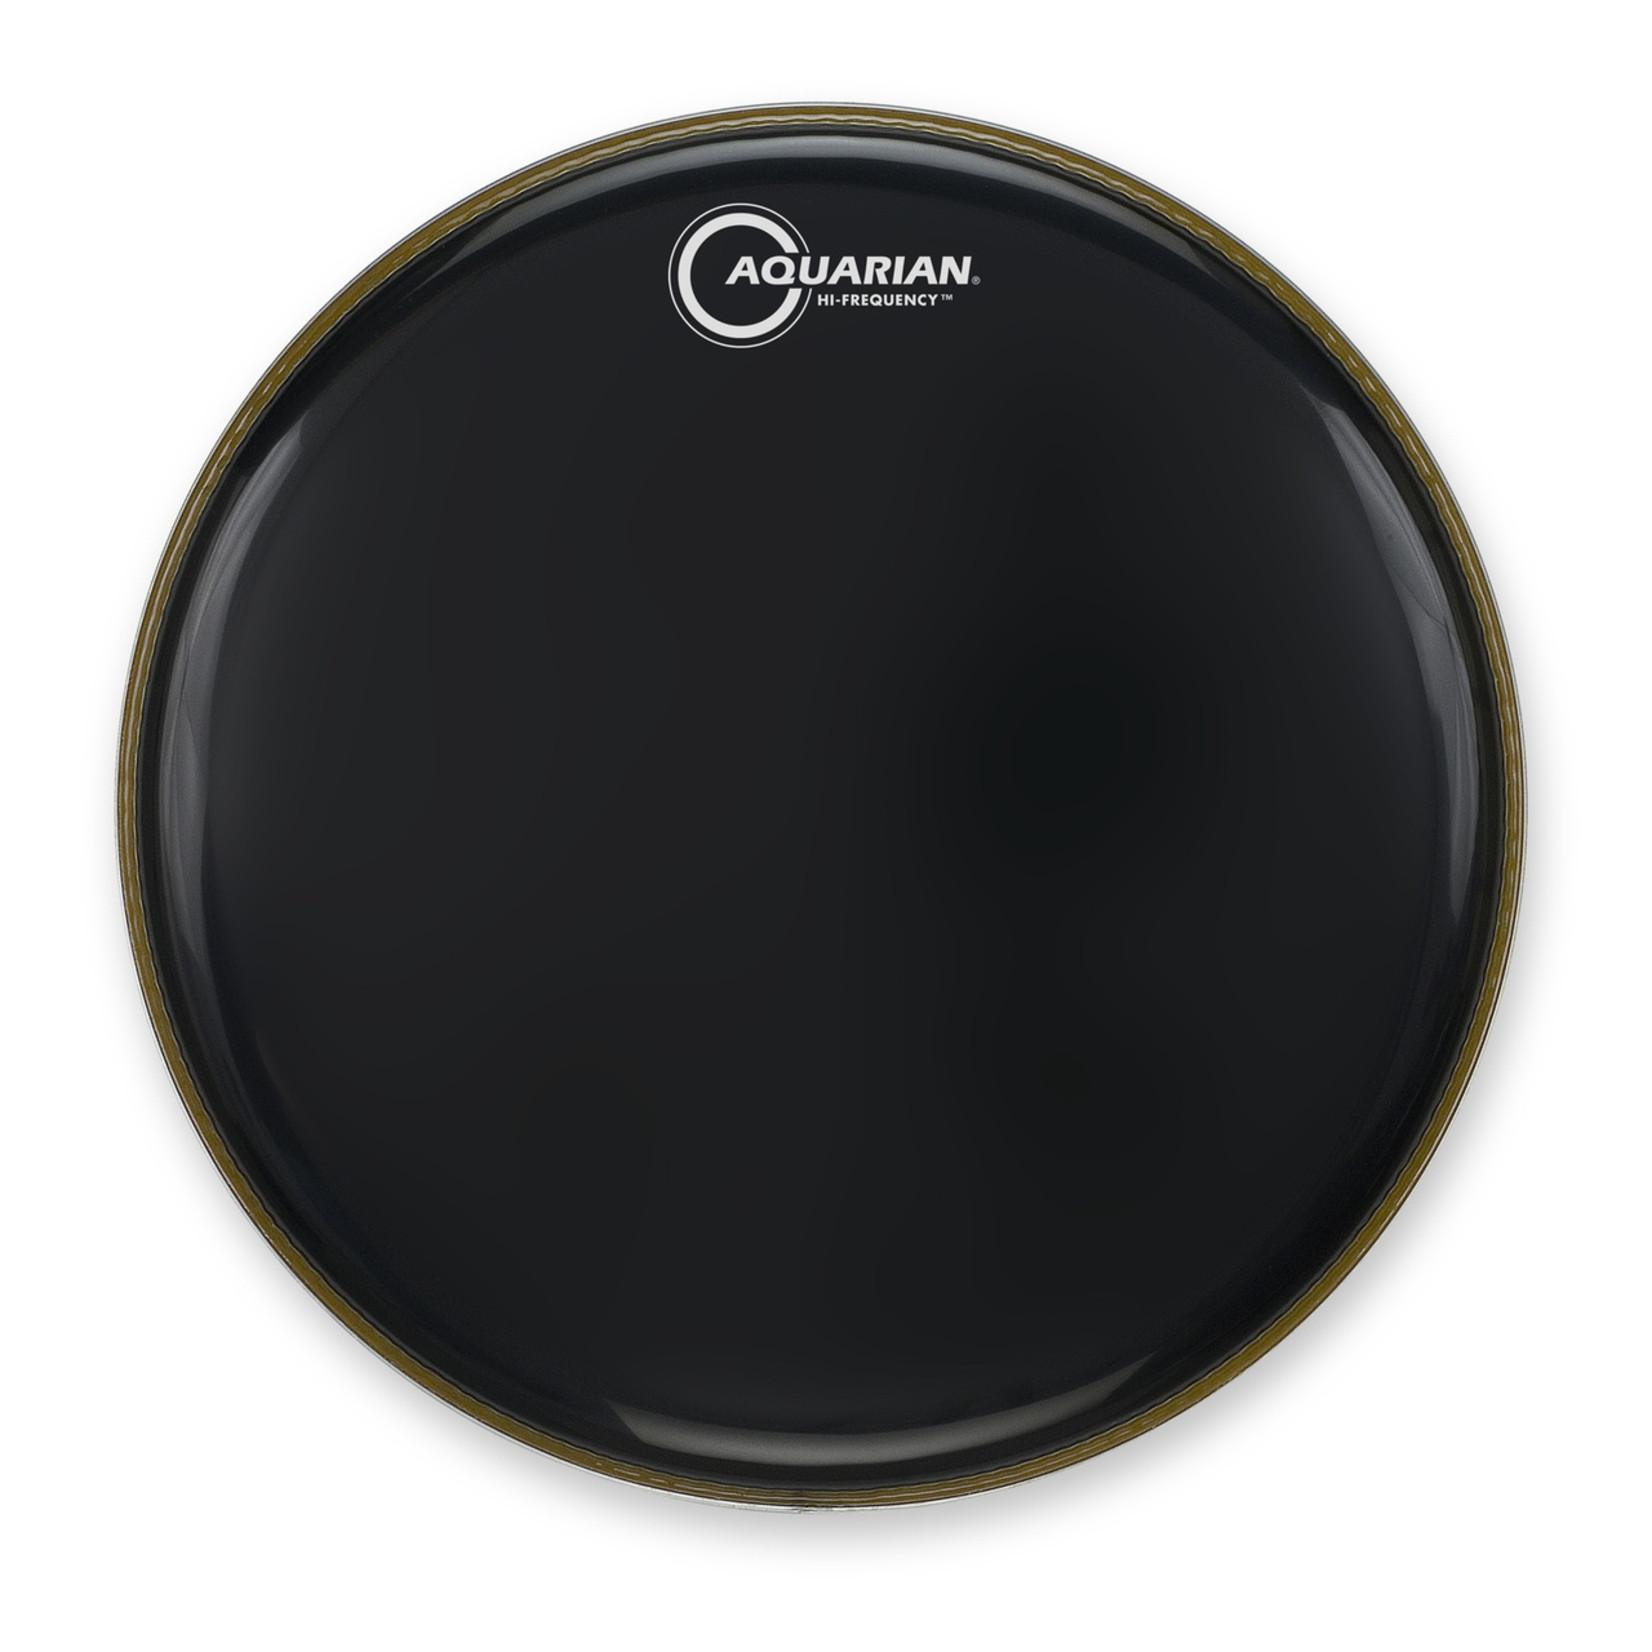 Aquarian Aquarian Hi-Frequency Black Video Gloss Bass Drum